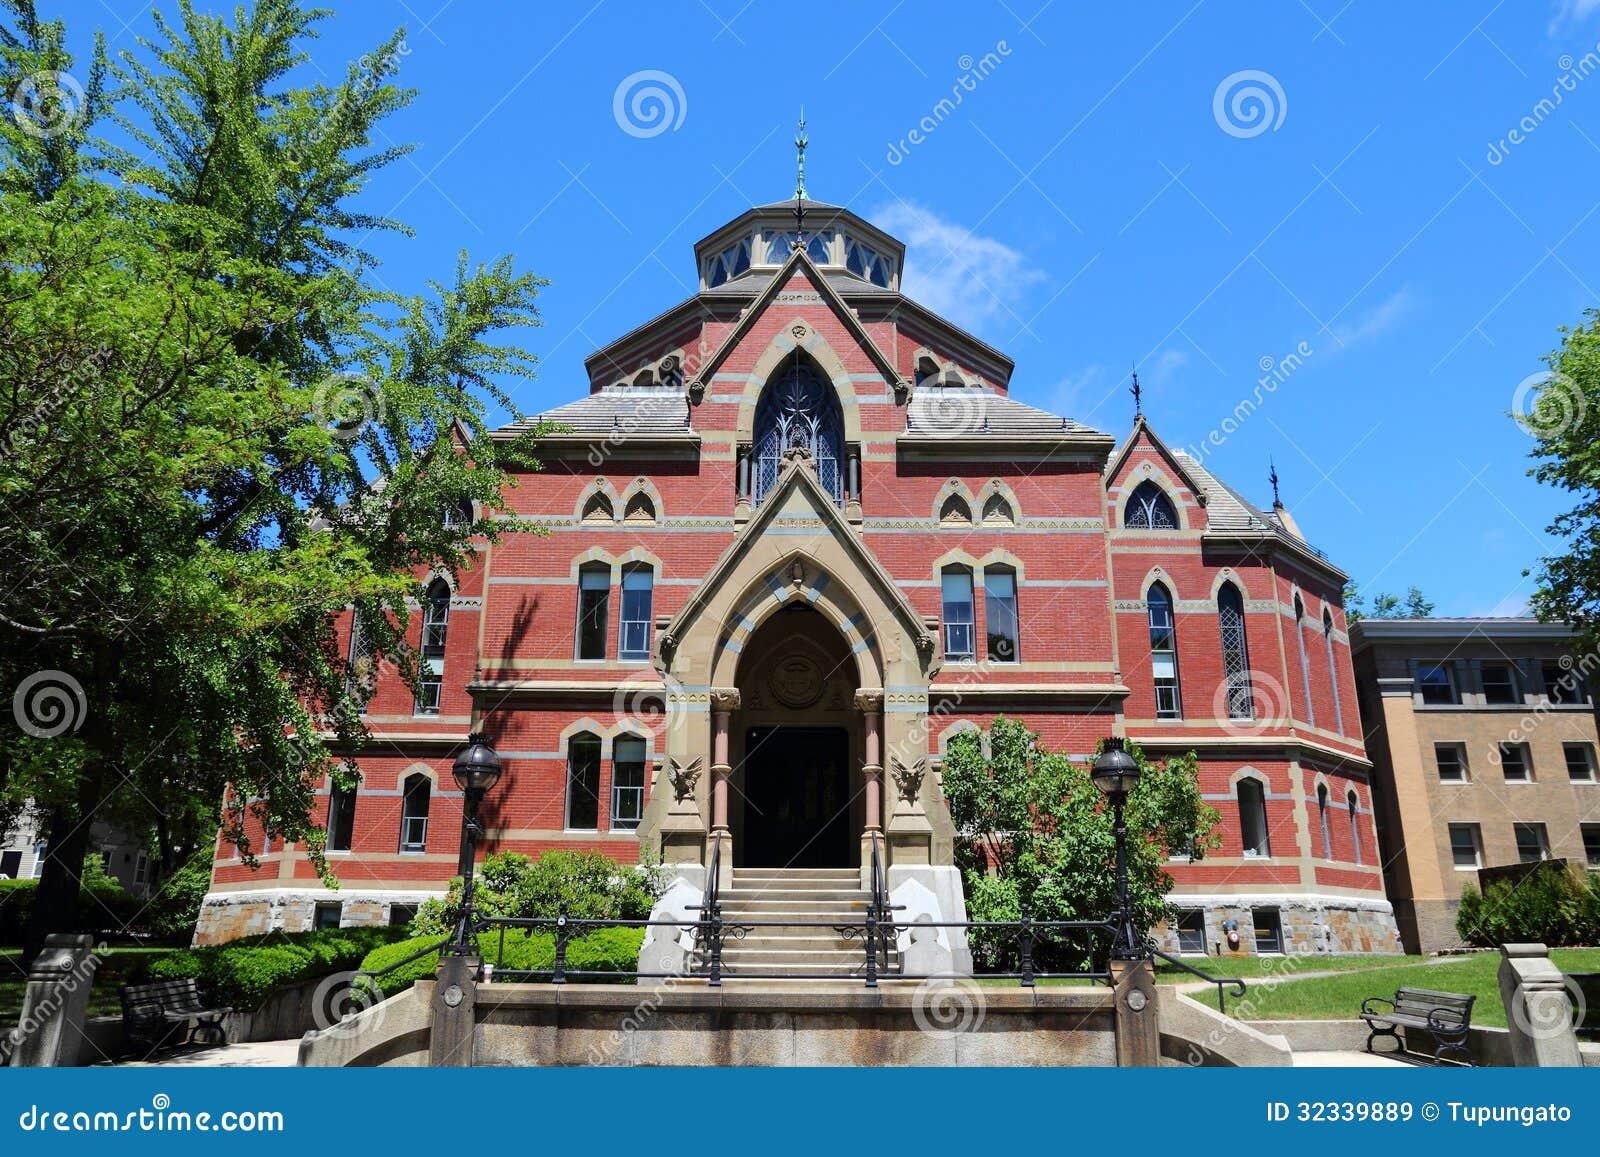 Providence Rhode Island  United States